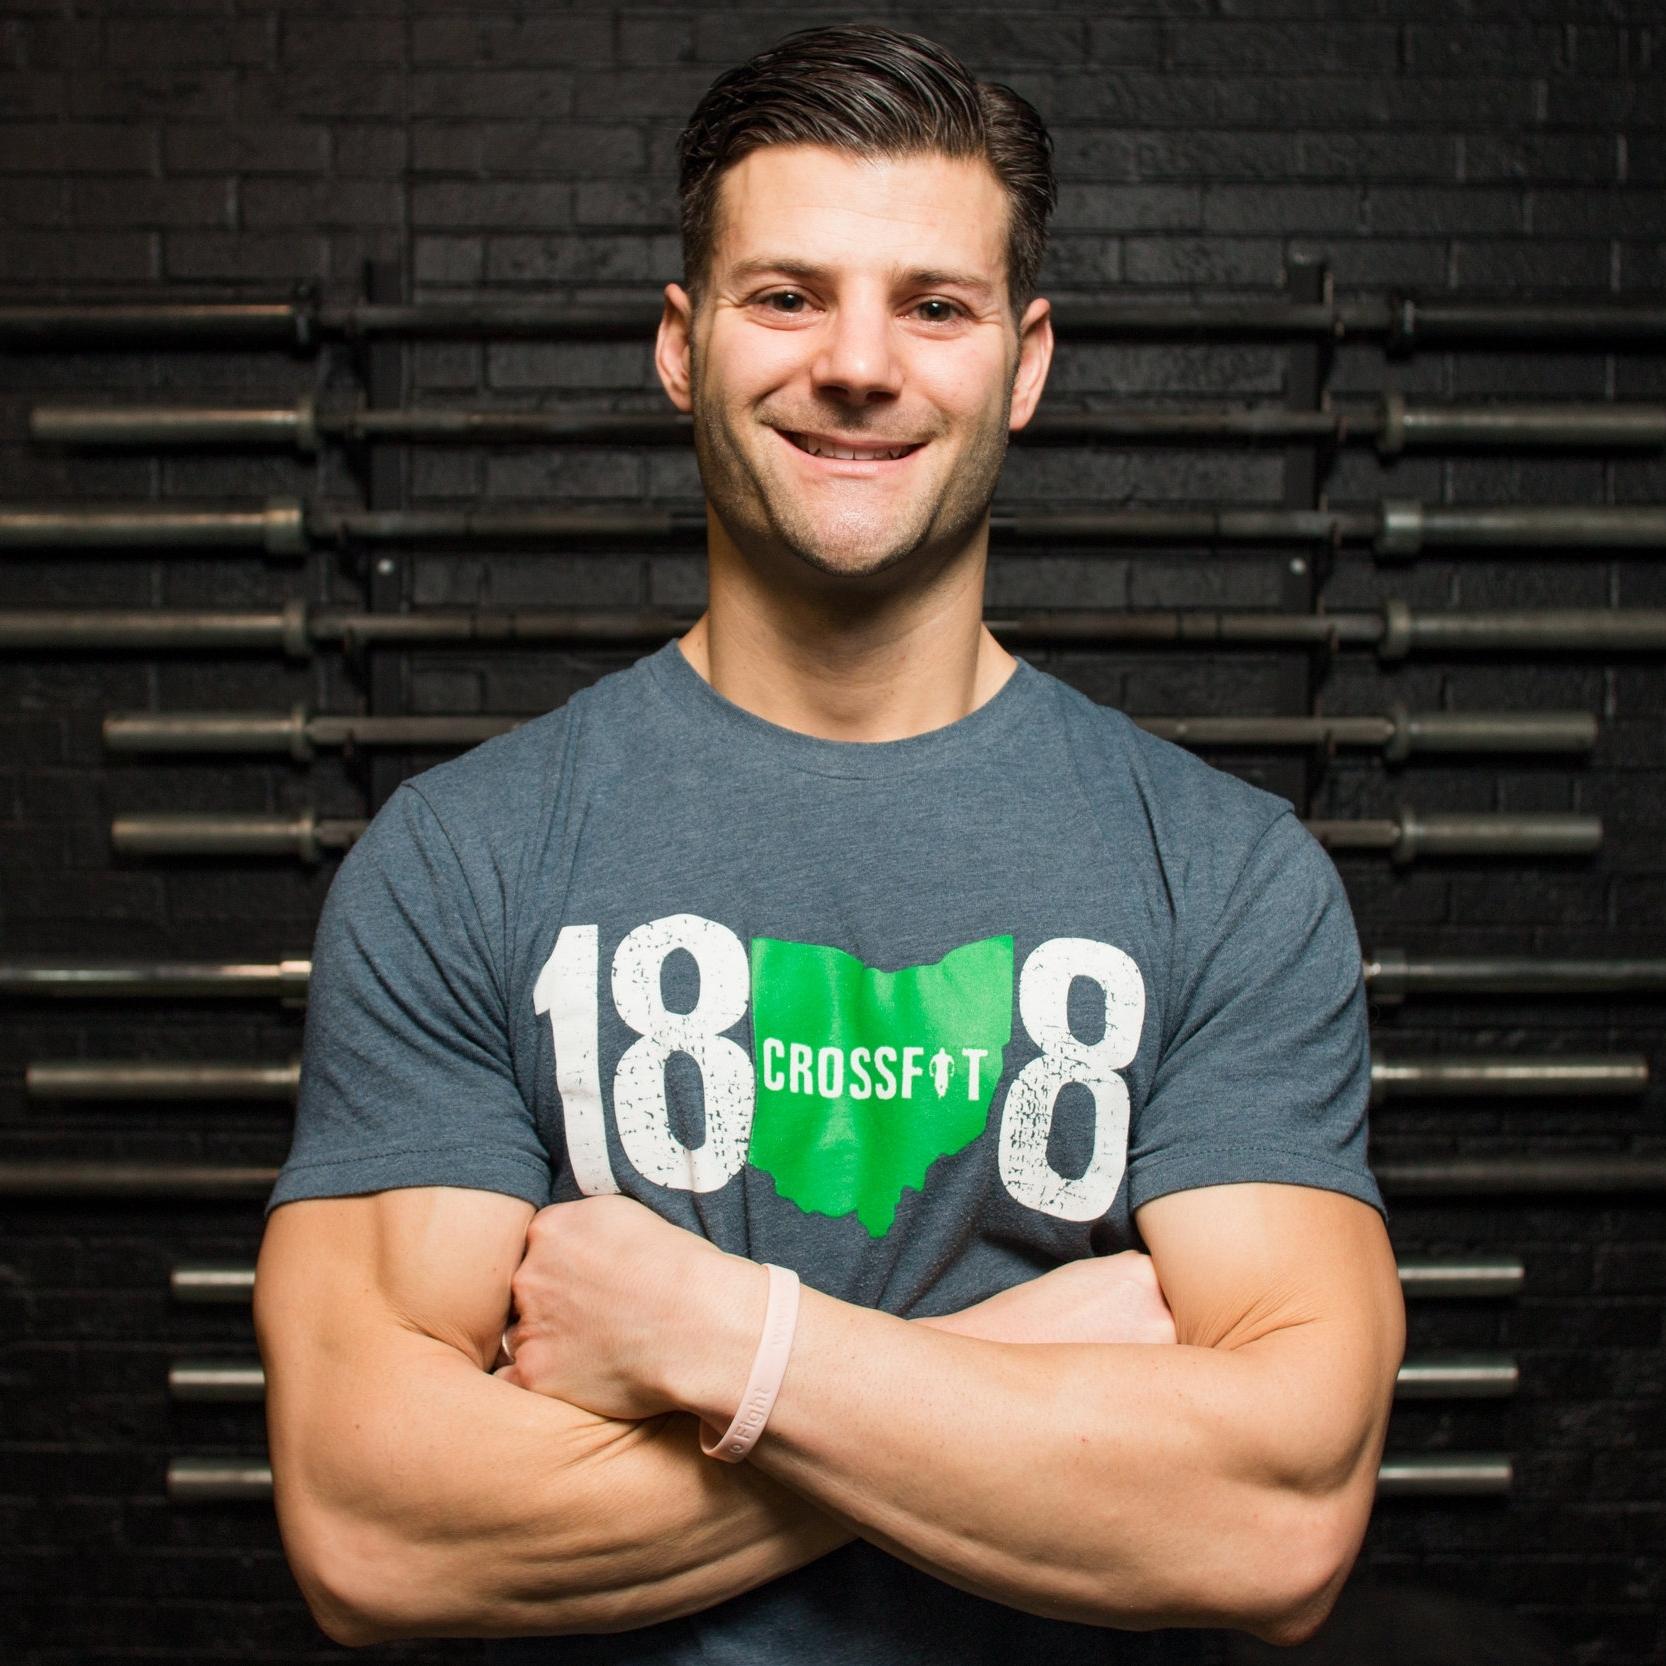 CrossFit Level 2 Trainer, Integrative Nutrition Health Coach